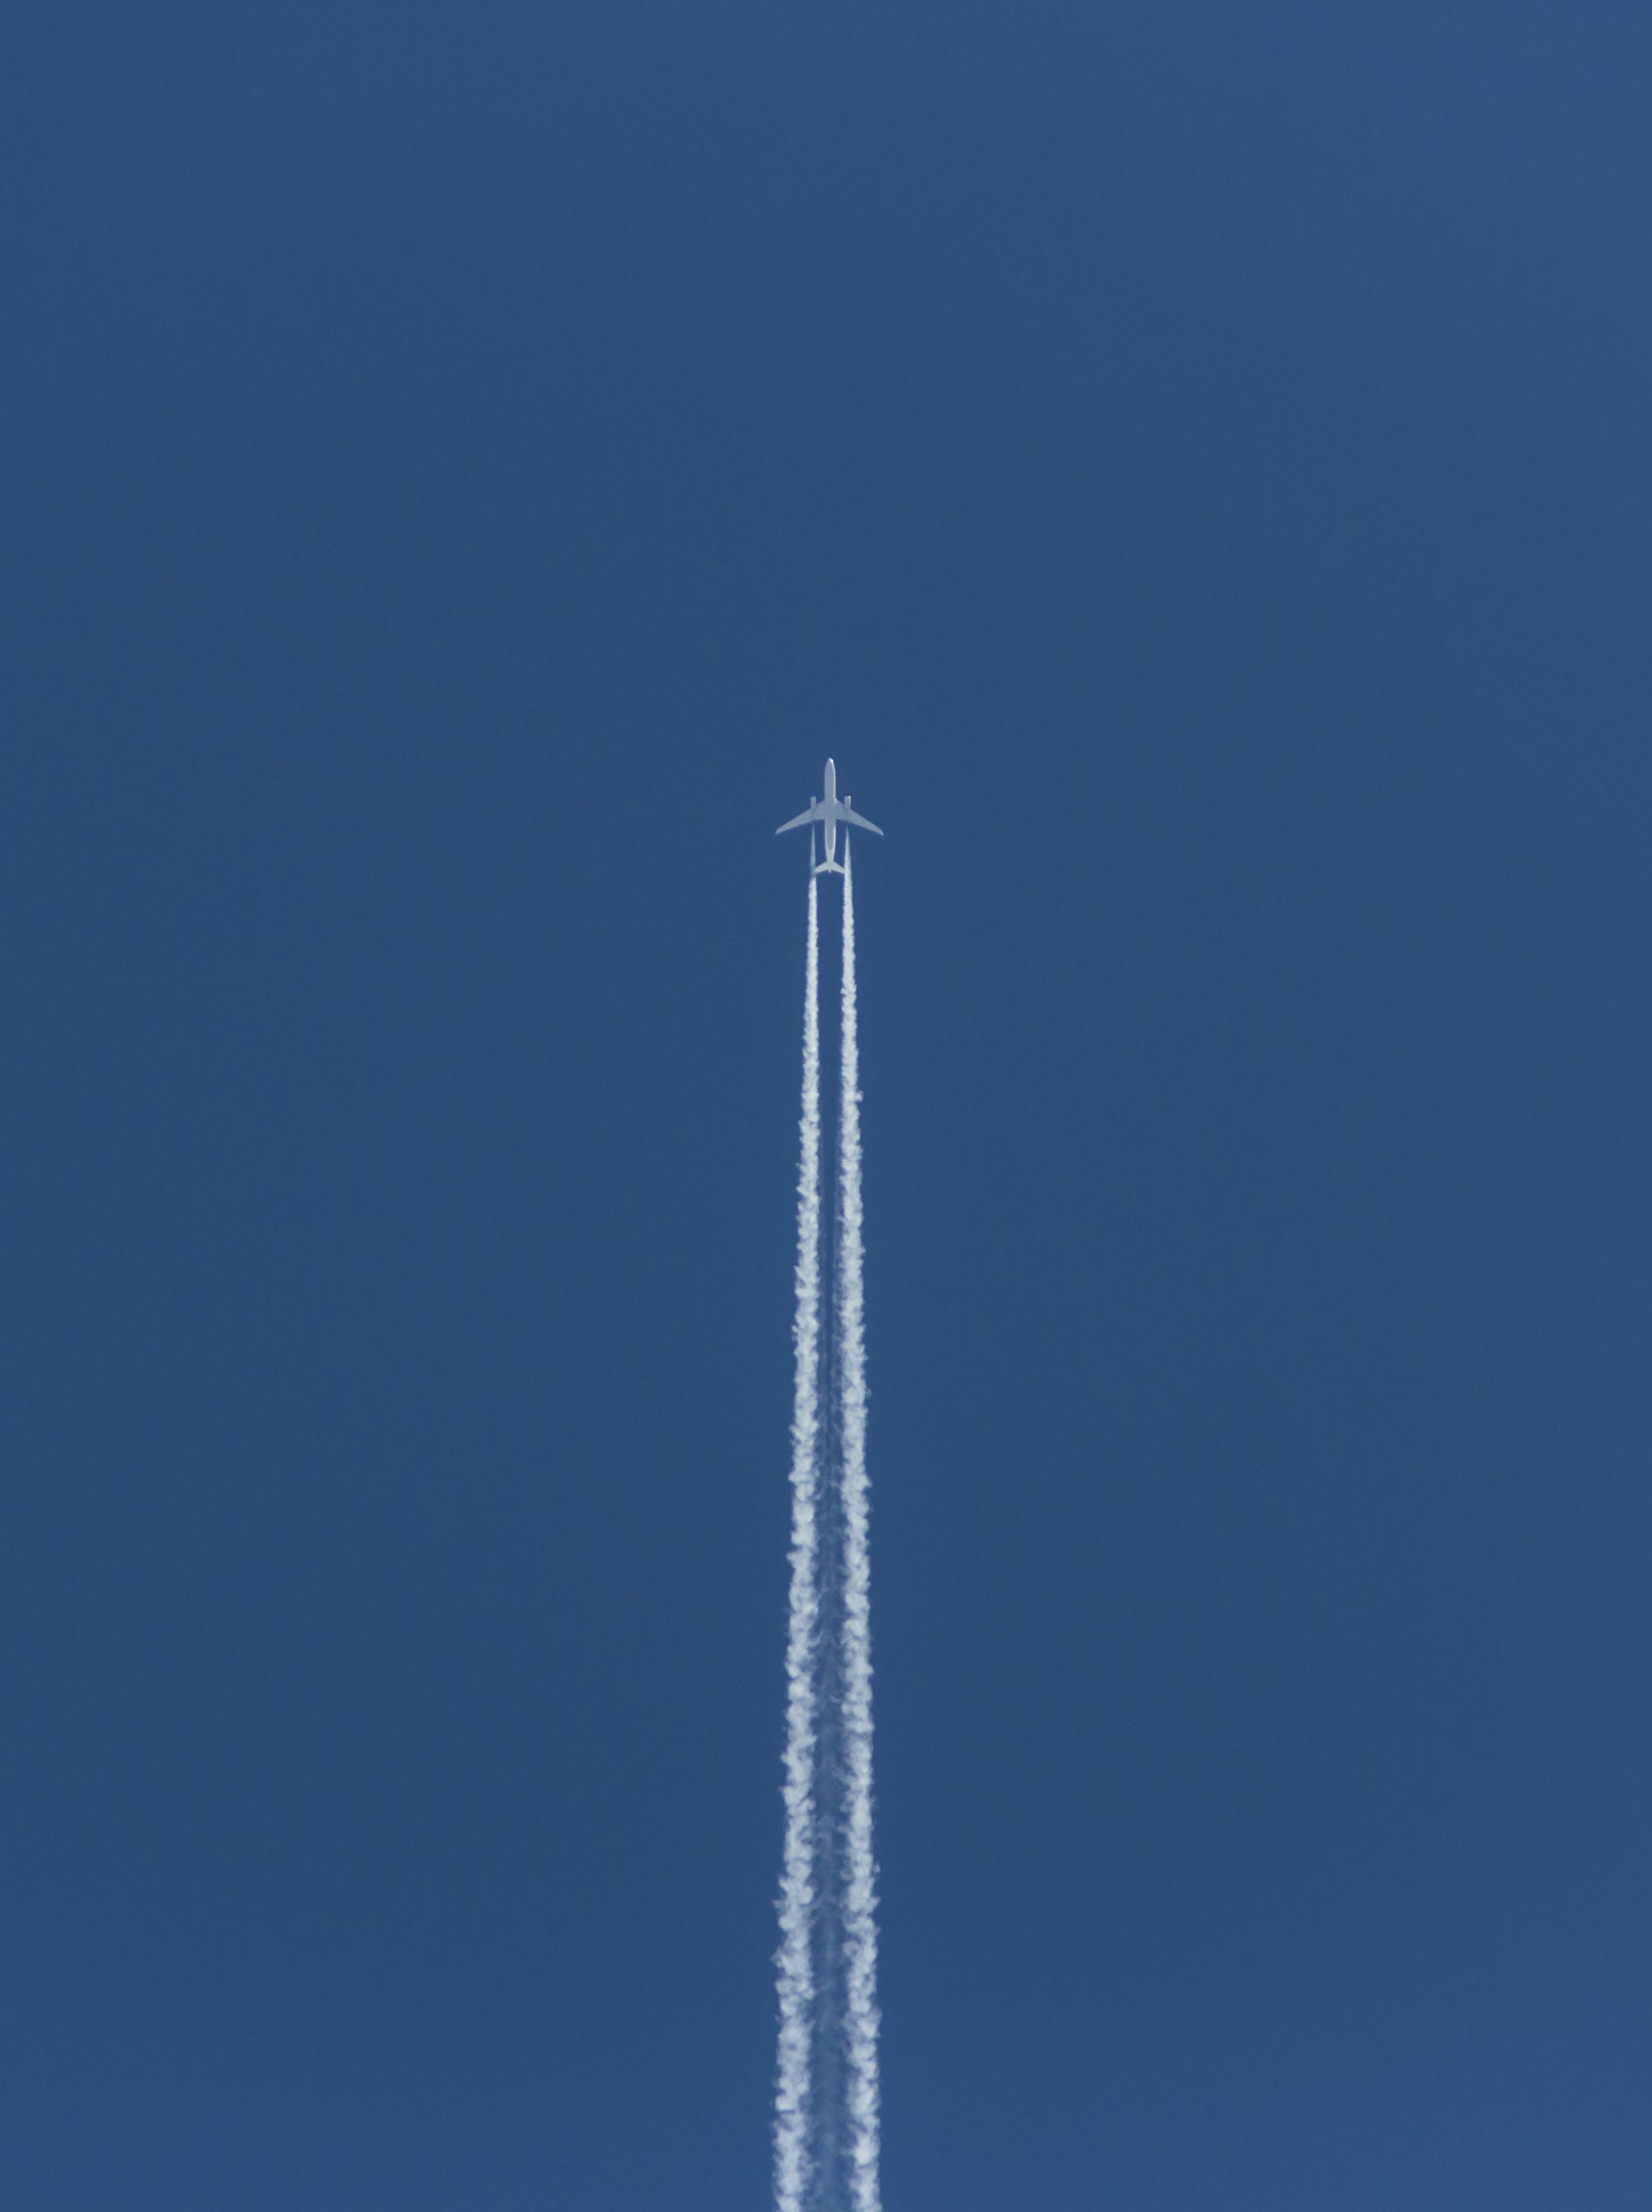 Free stock photo of aeroplane, blue, sky, symmetry